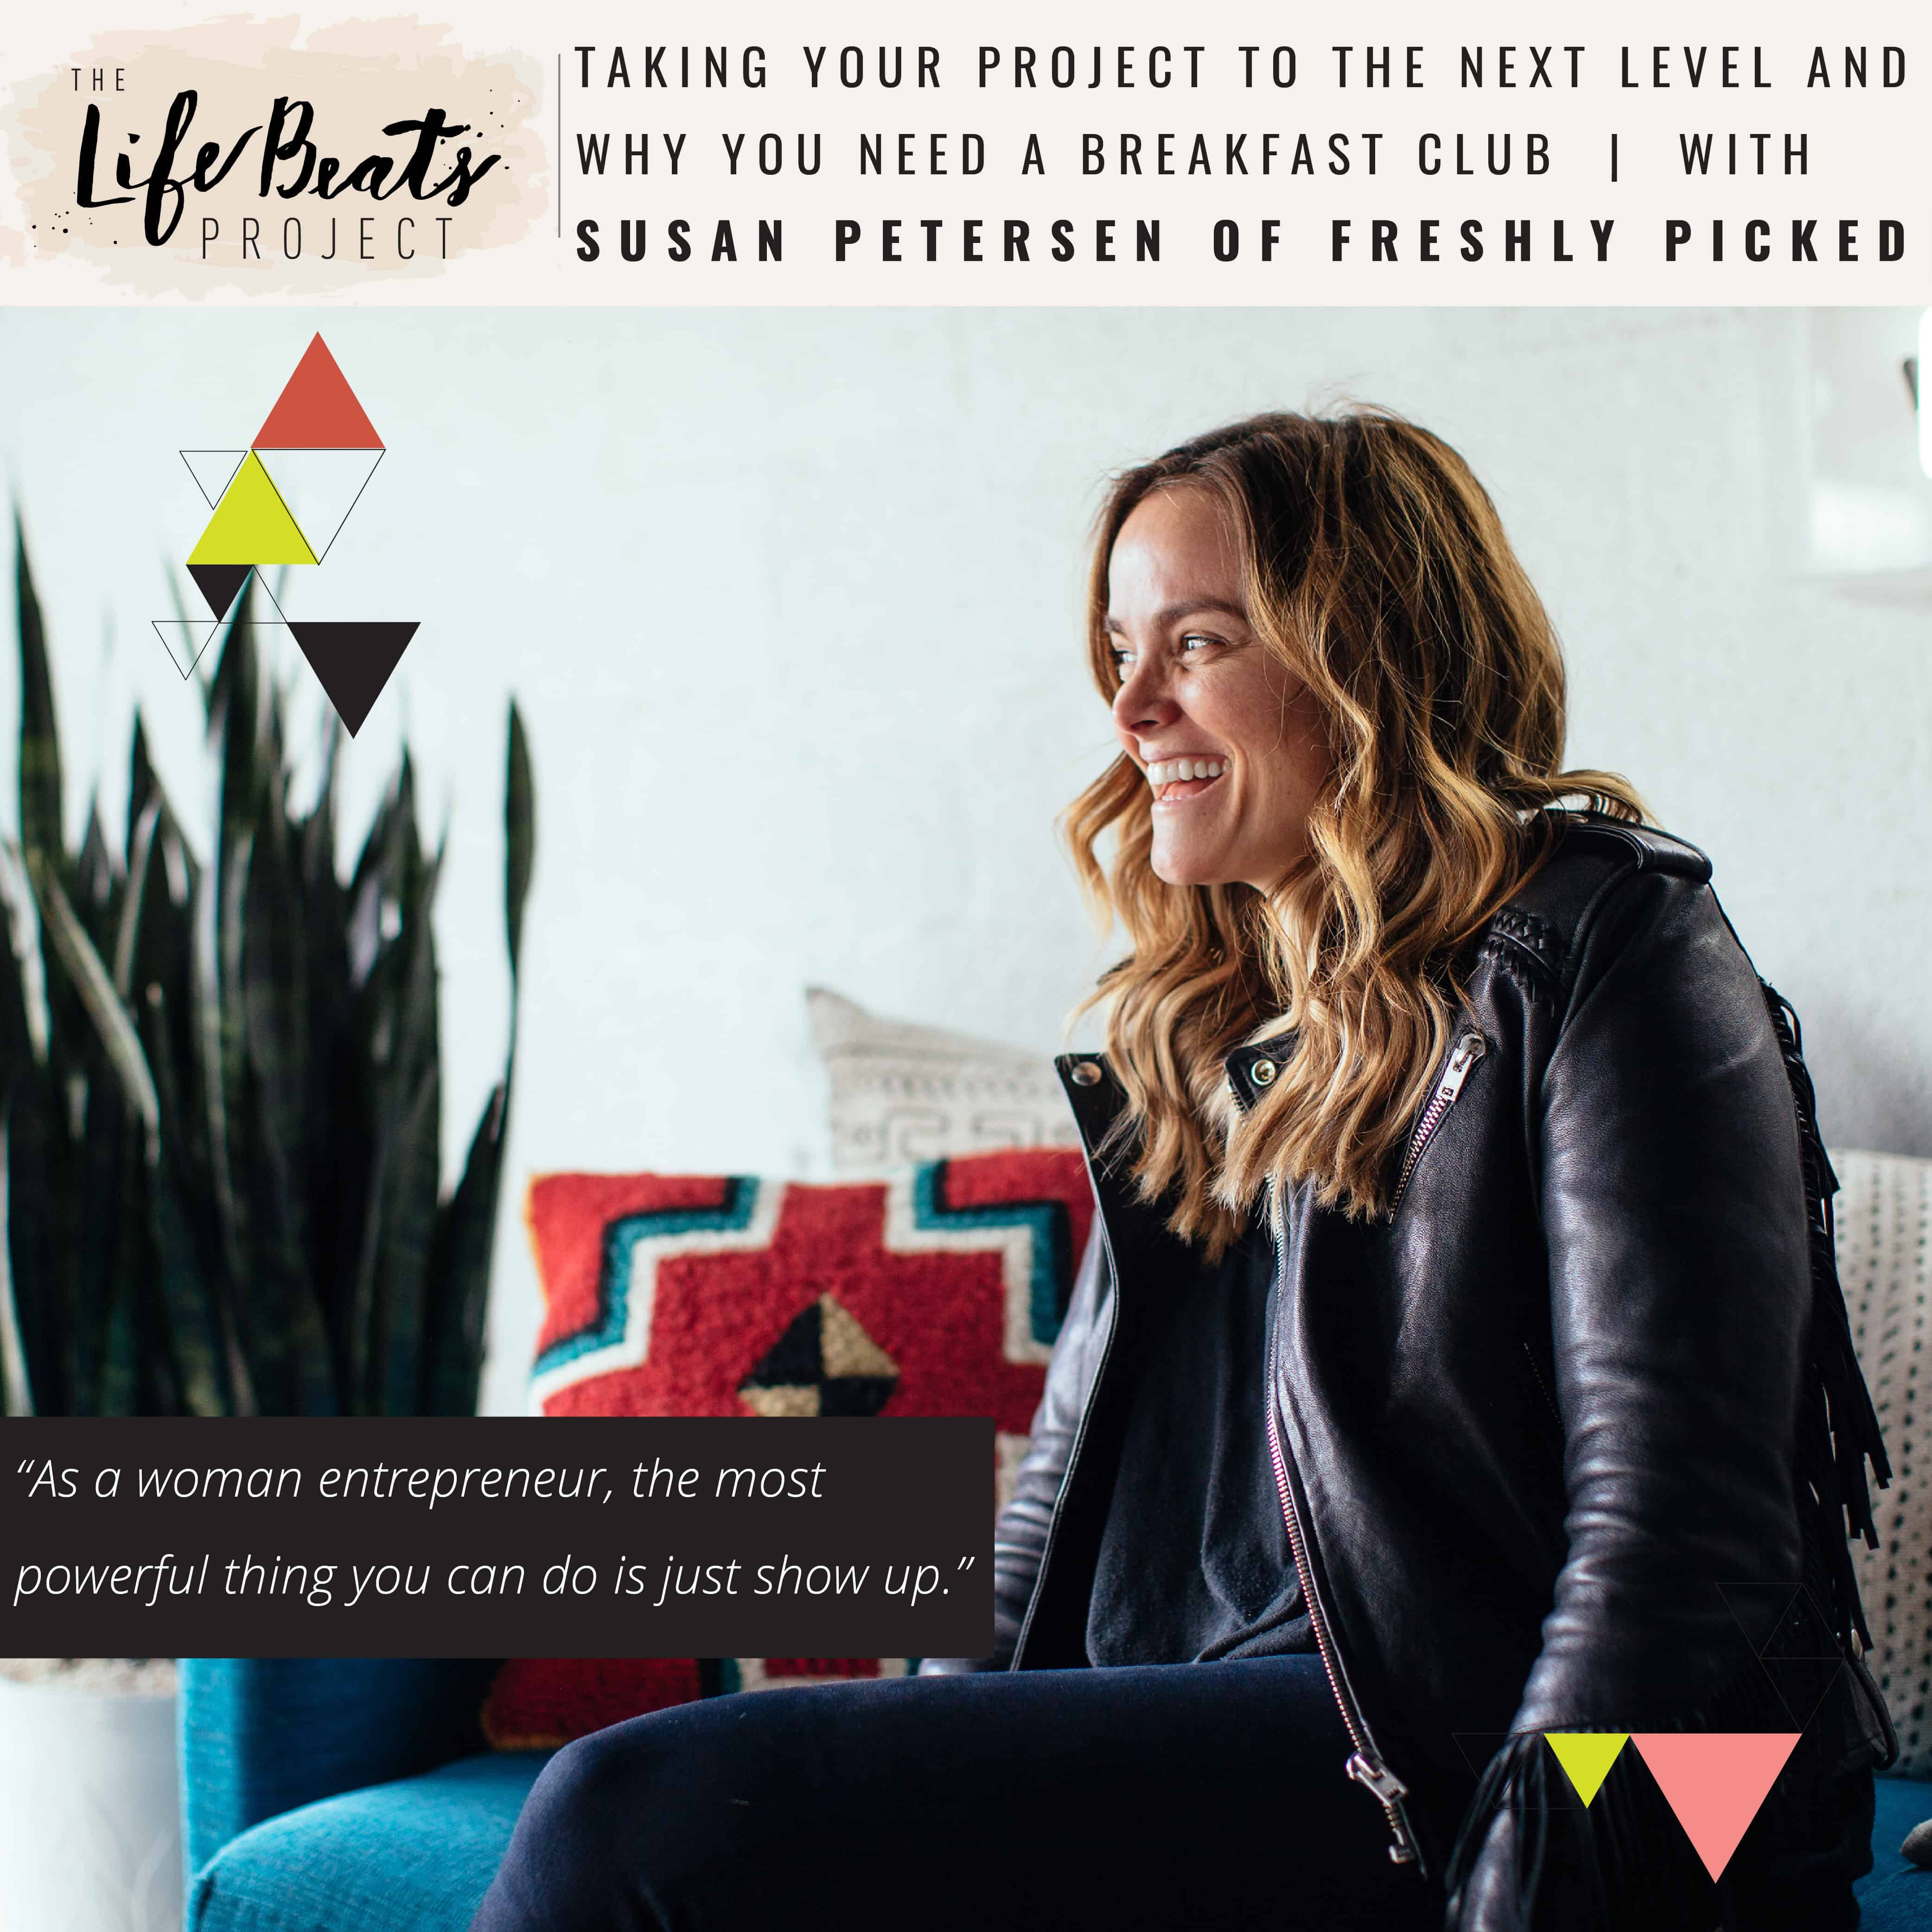 women entrepreneur next level Breakfast Club Susan Petersen Freshly Picked